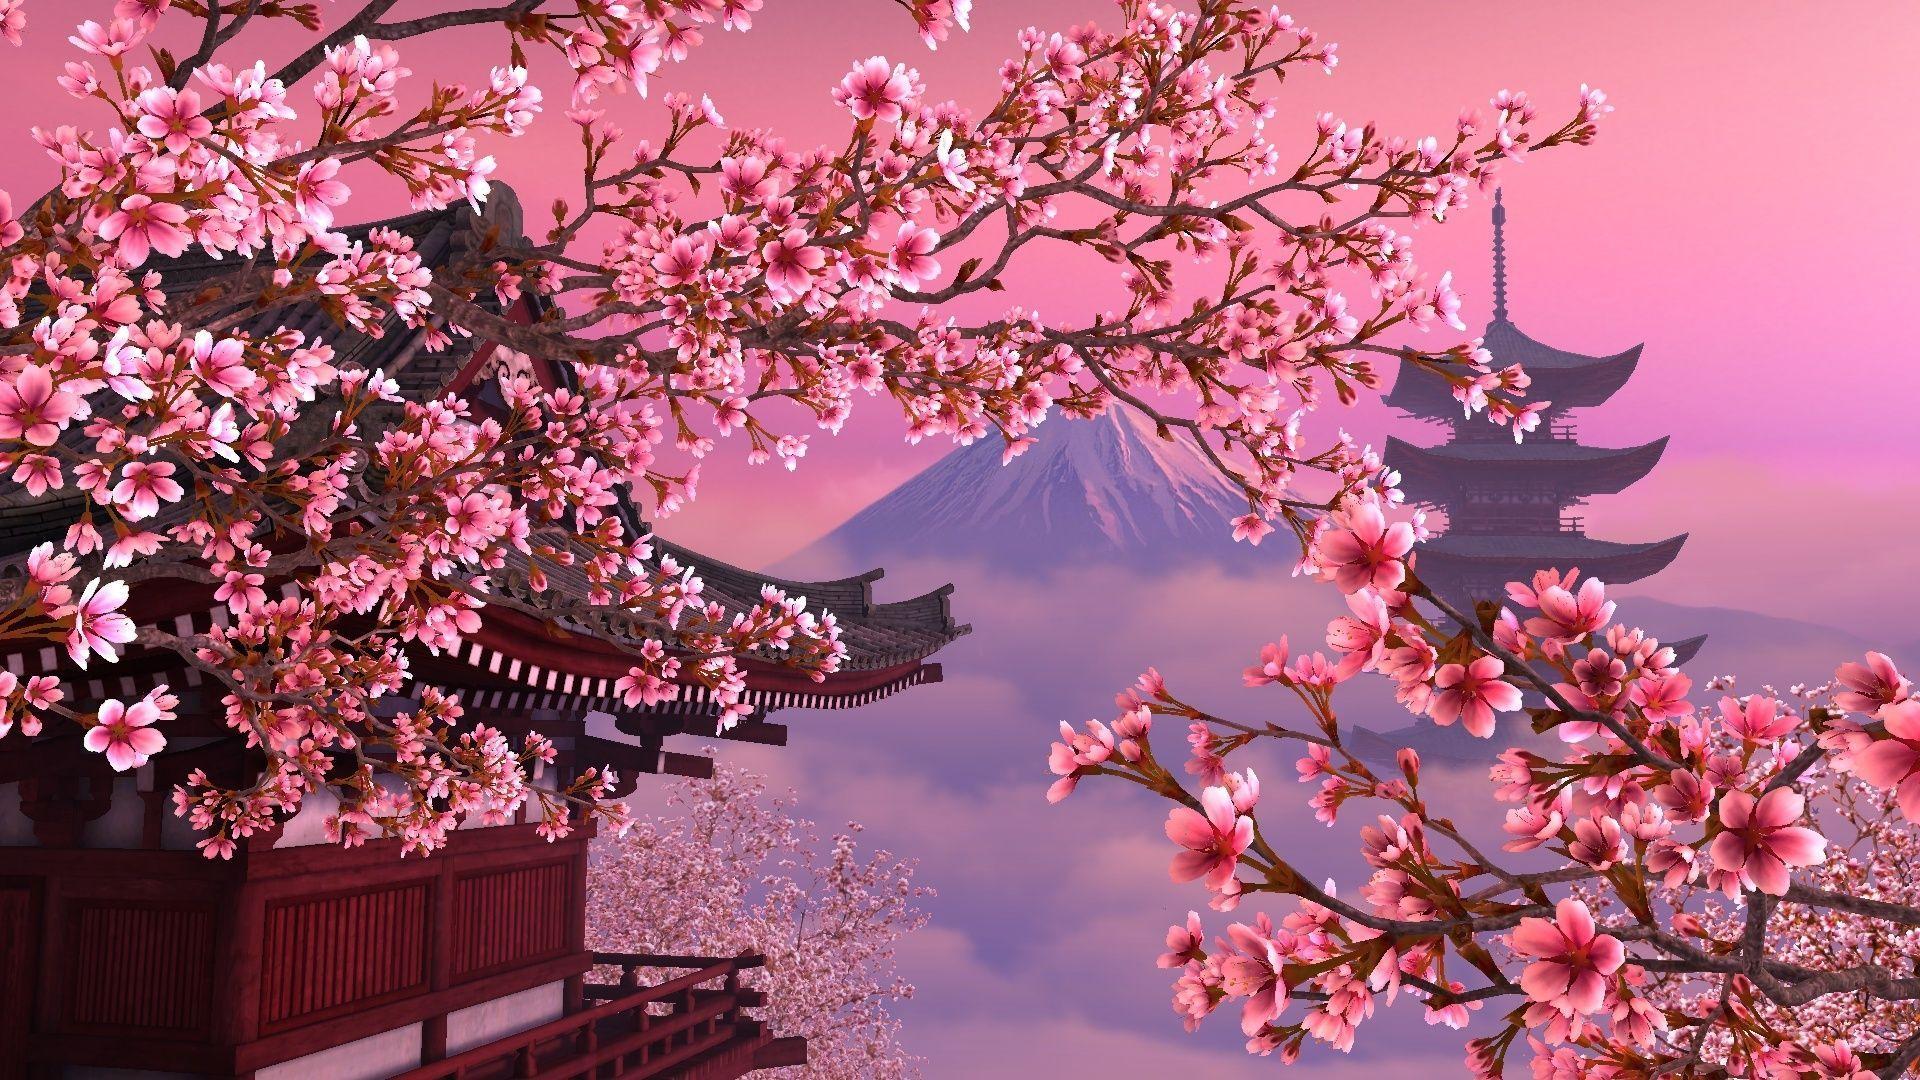 Japanese Aesthetic Desktop Wallpapers Wallpaper Cave